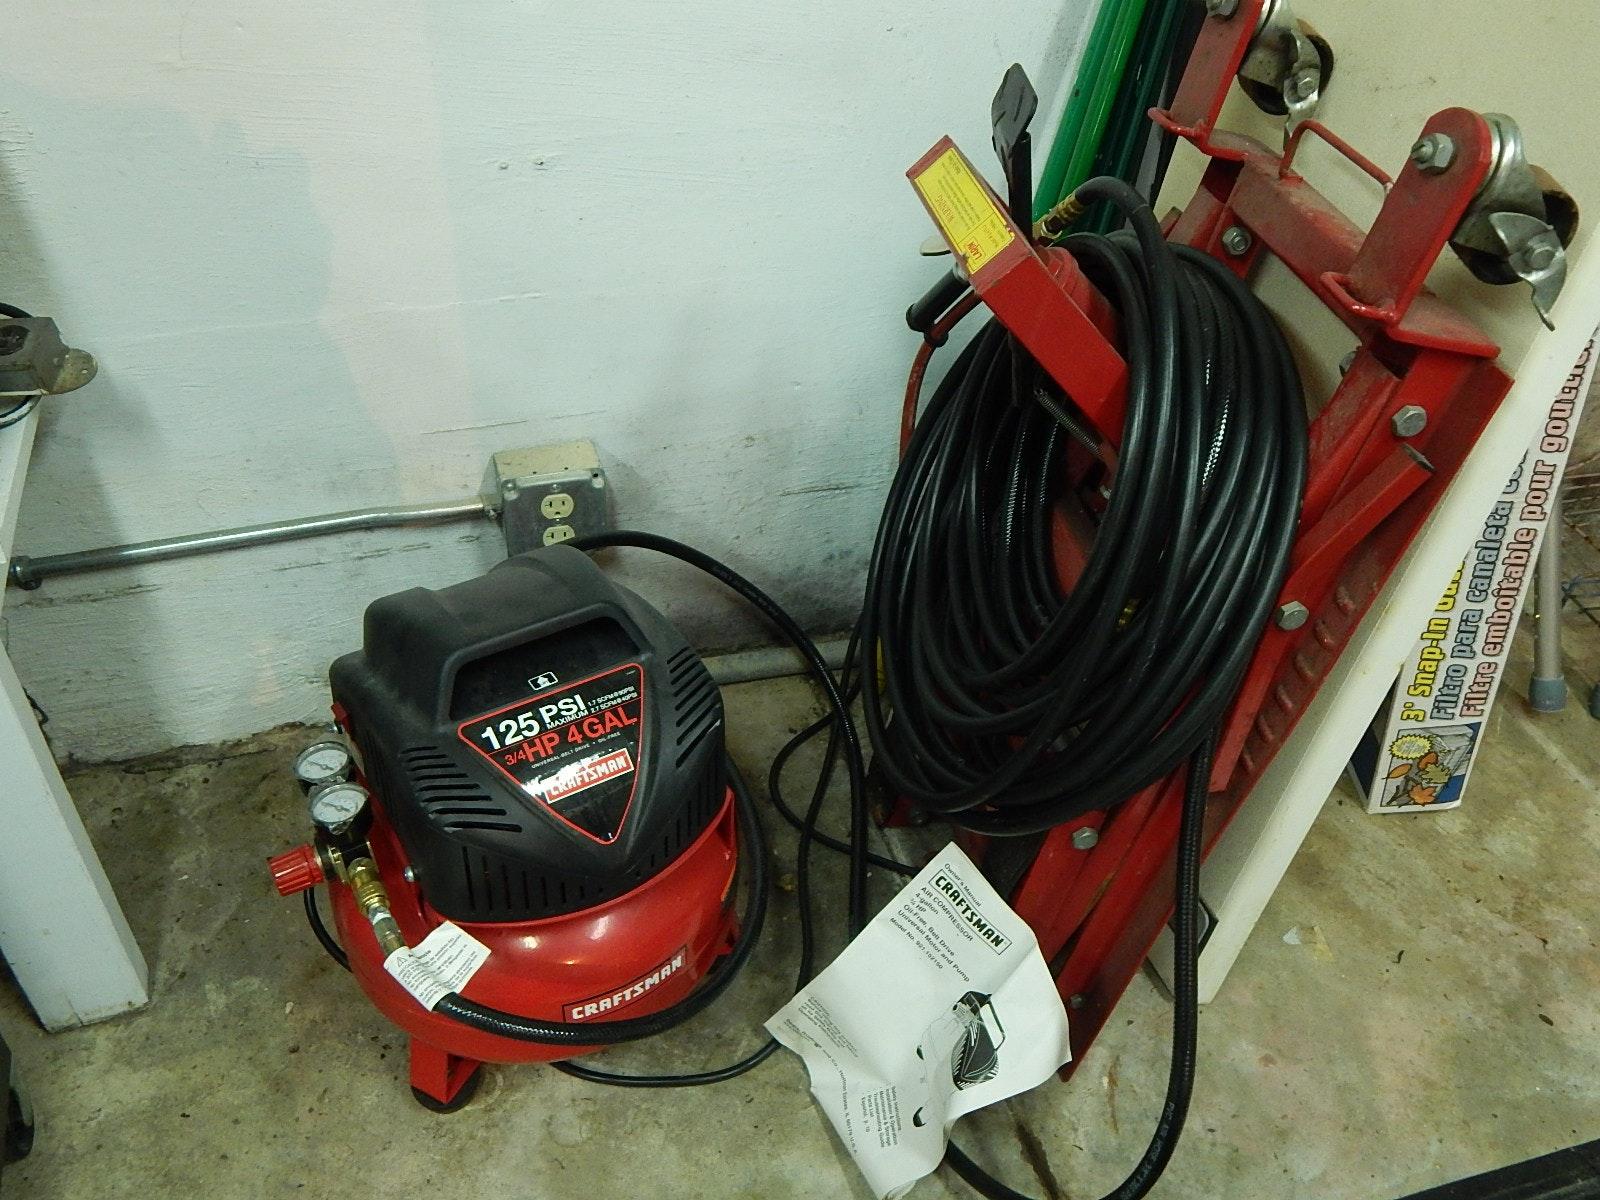 Craftsman Air Compressor, Hose, and Larin Lift